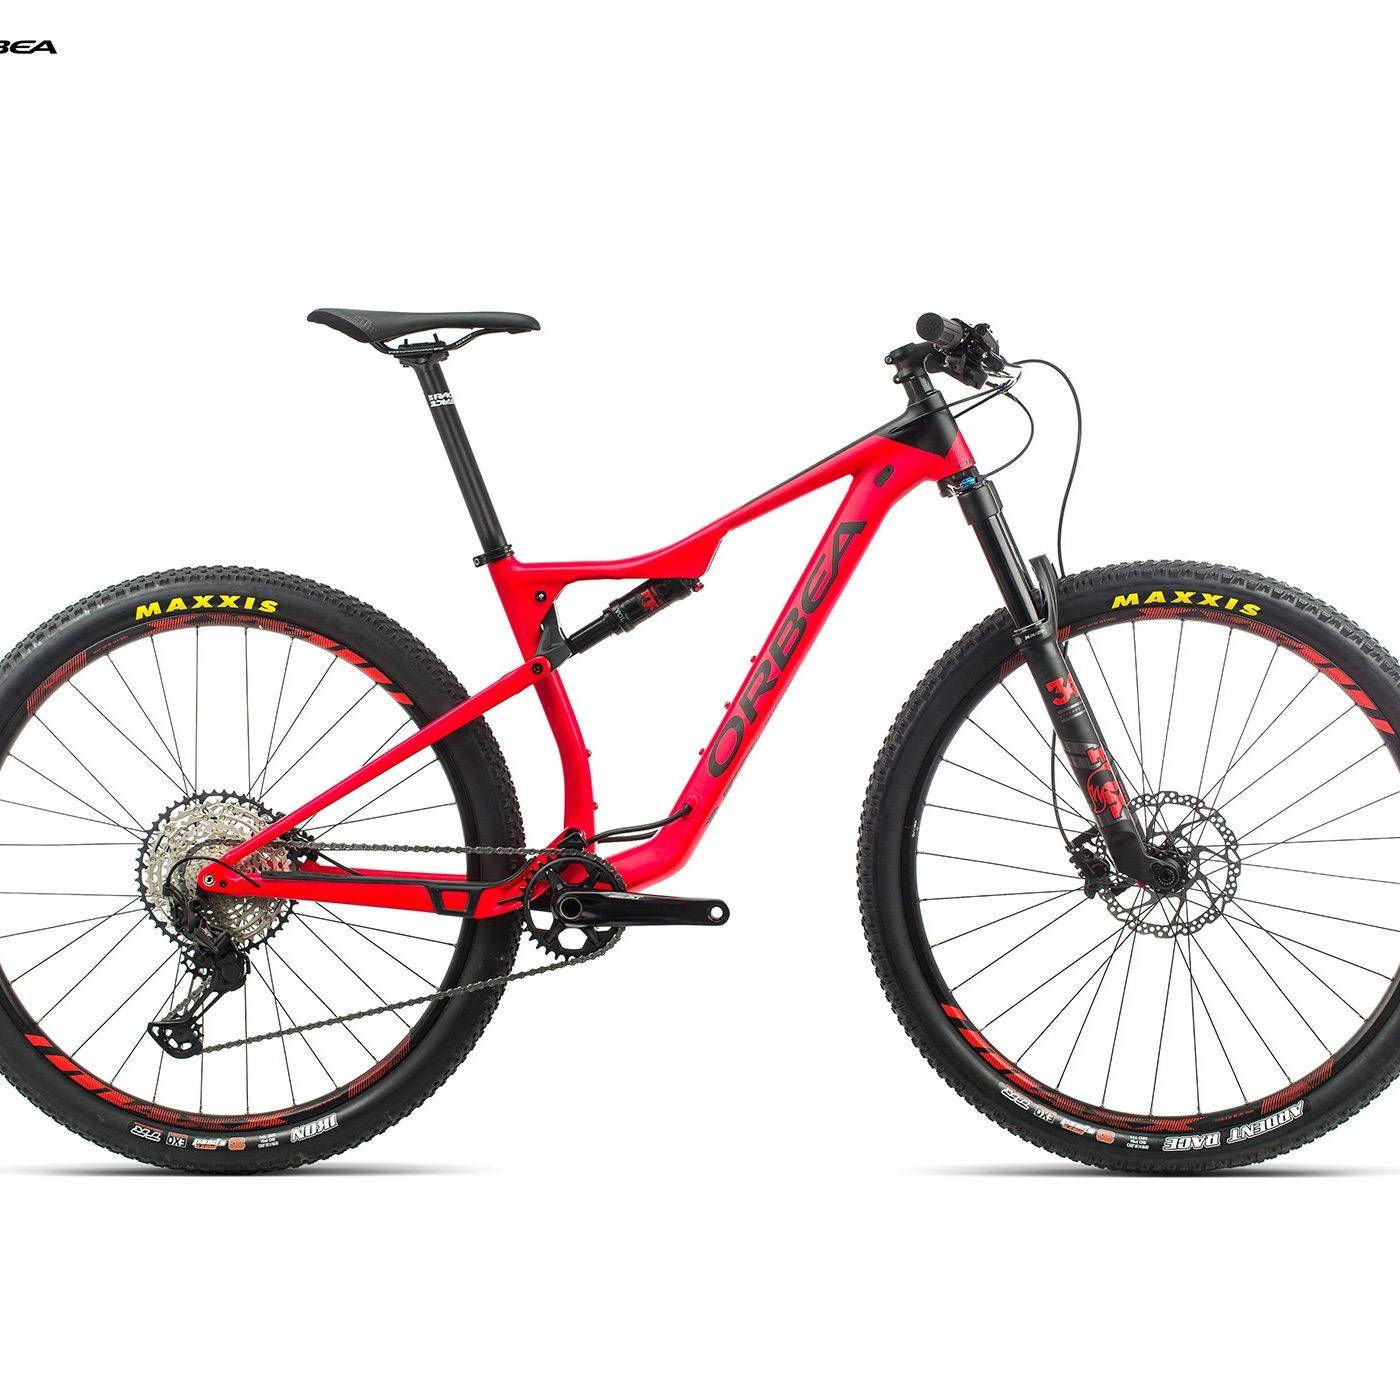 ORBEA OIZ 29 H20 - BRIGHT RED / ZWART (DOF) @G-Bikes